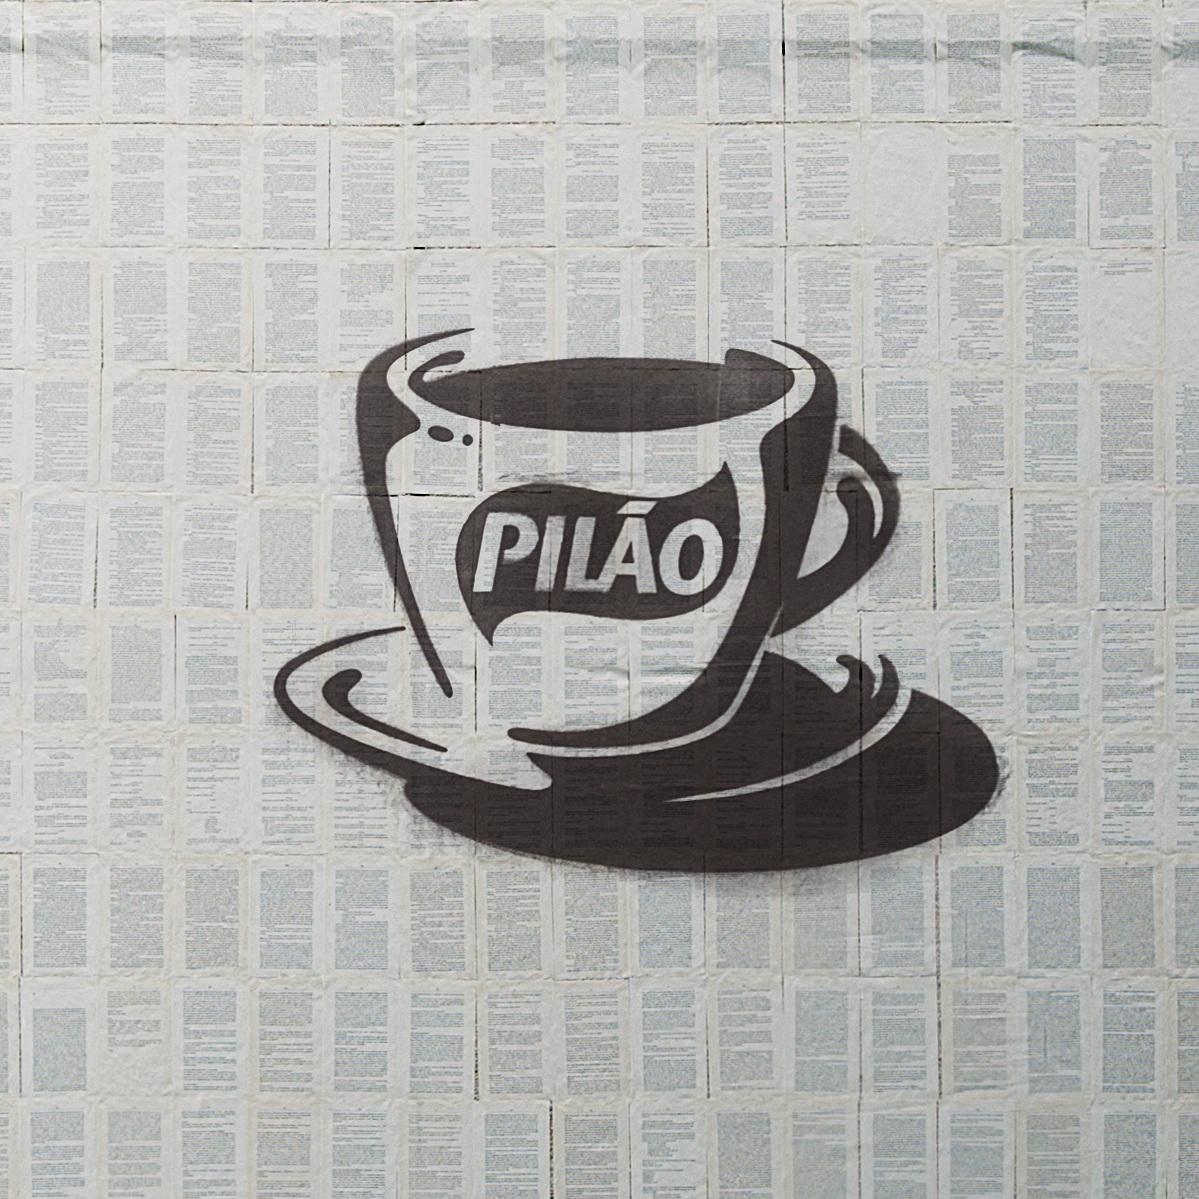 JWT | Pilão | A book in one shot